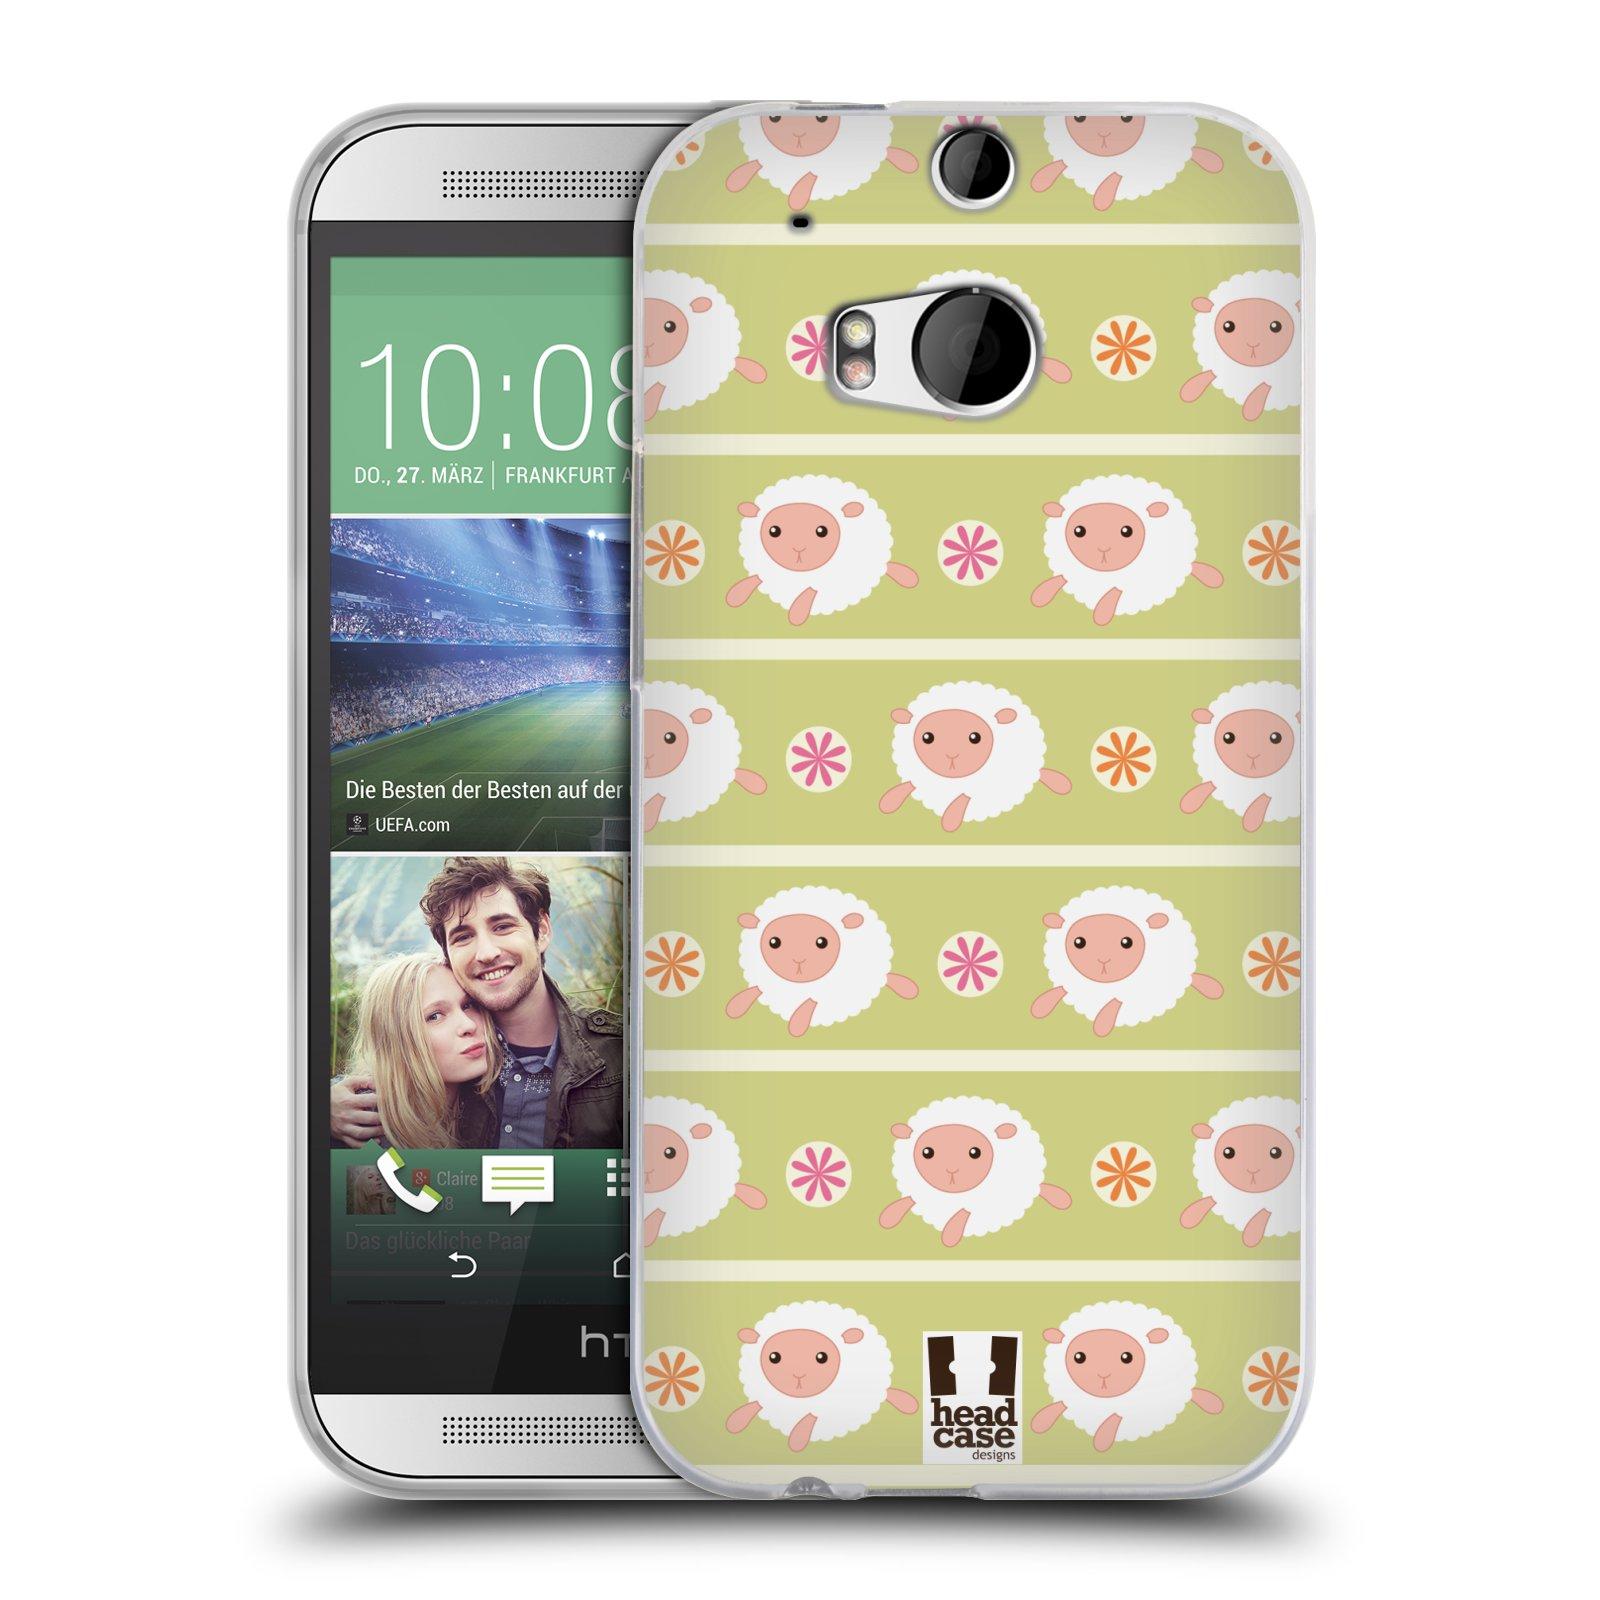 HEAD CASE silikonový obal na mobil HTC ONE (M8) vzor roztomilé zvířecí vzory ovečky